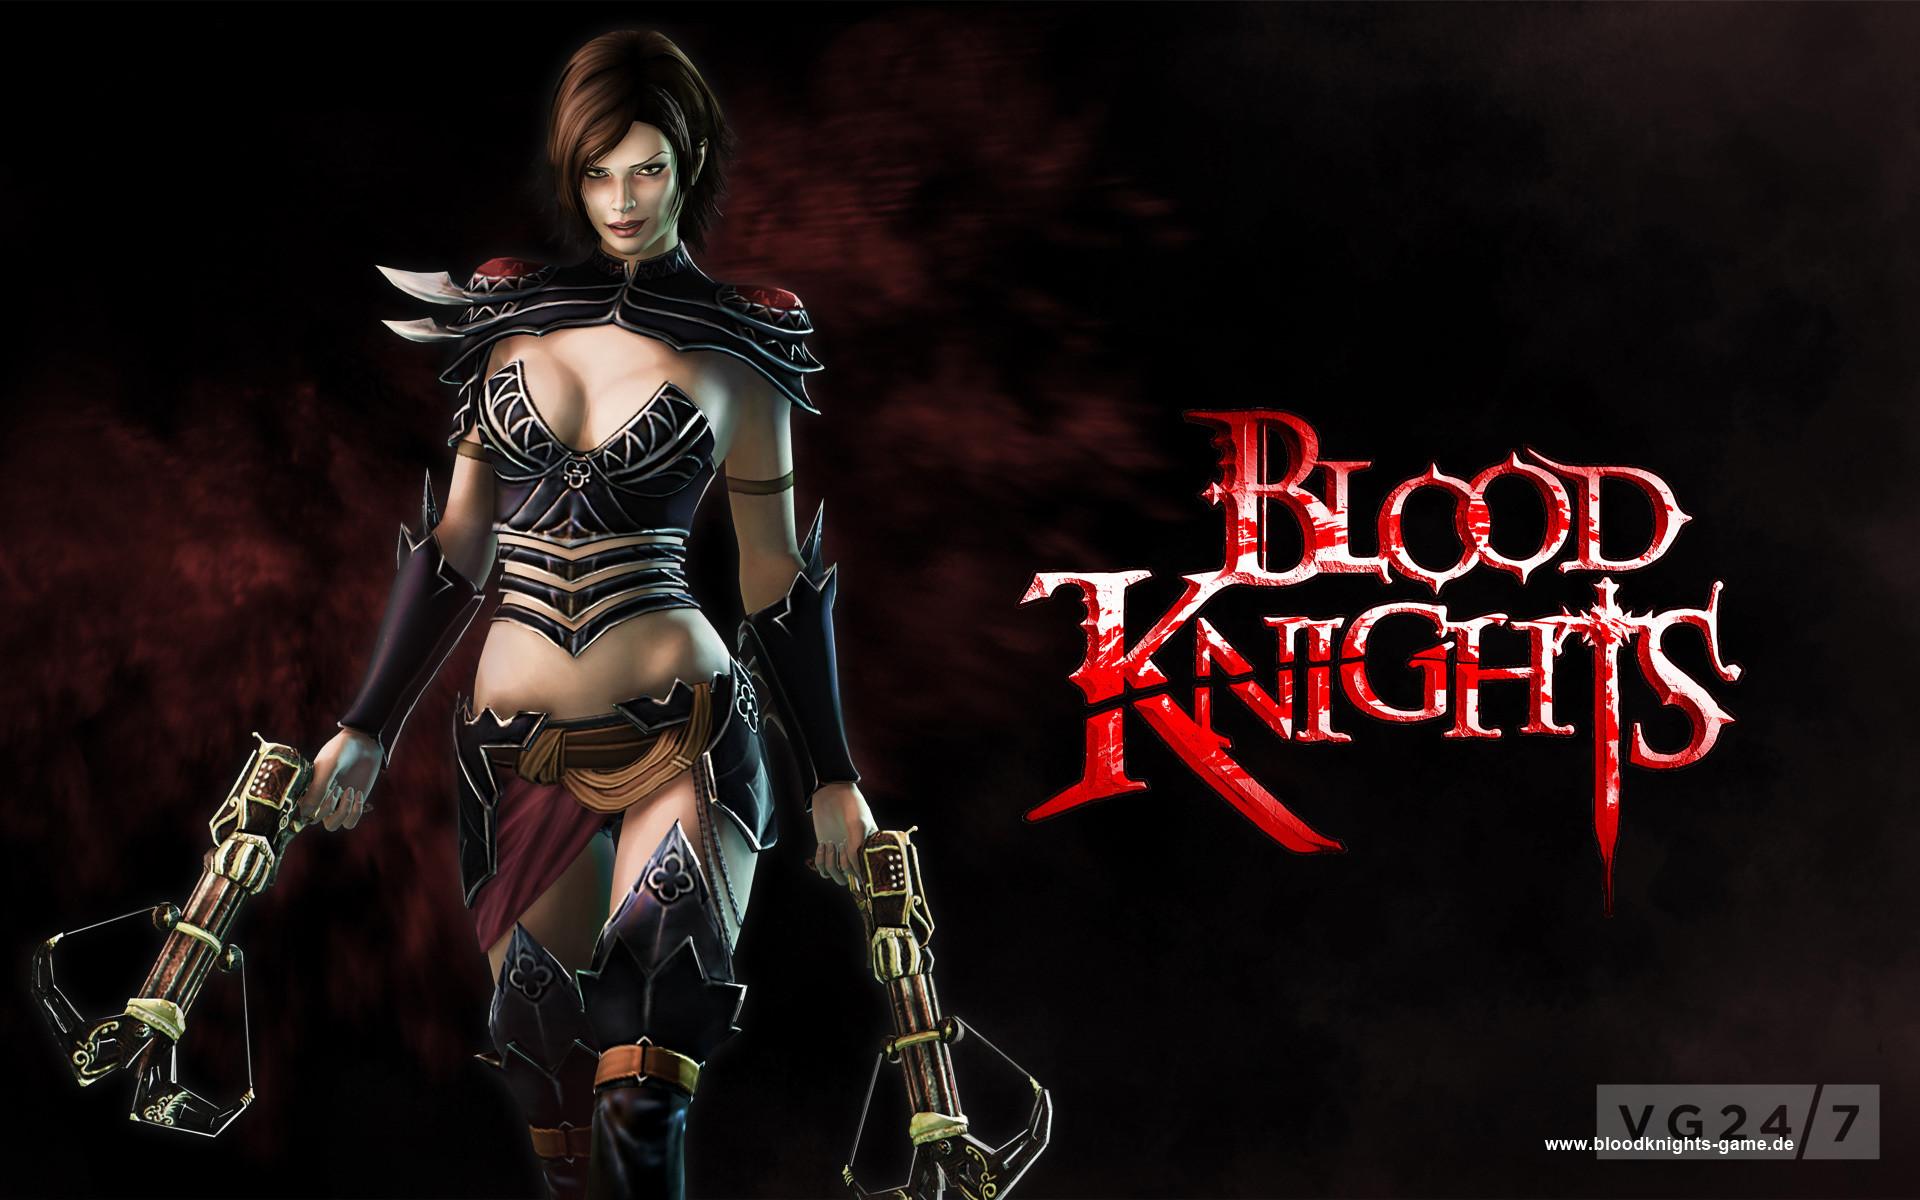 bloodknights-character-artwork-1-wallpaper-alysa_